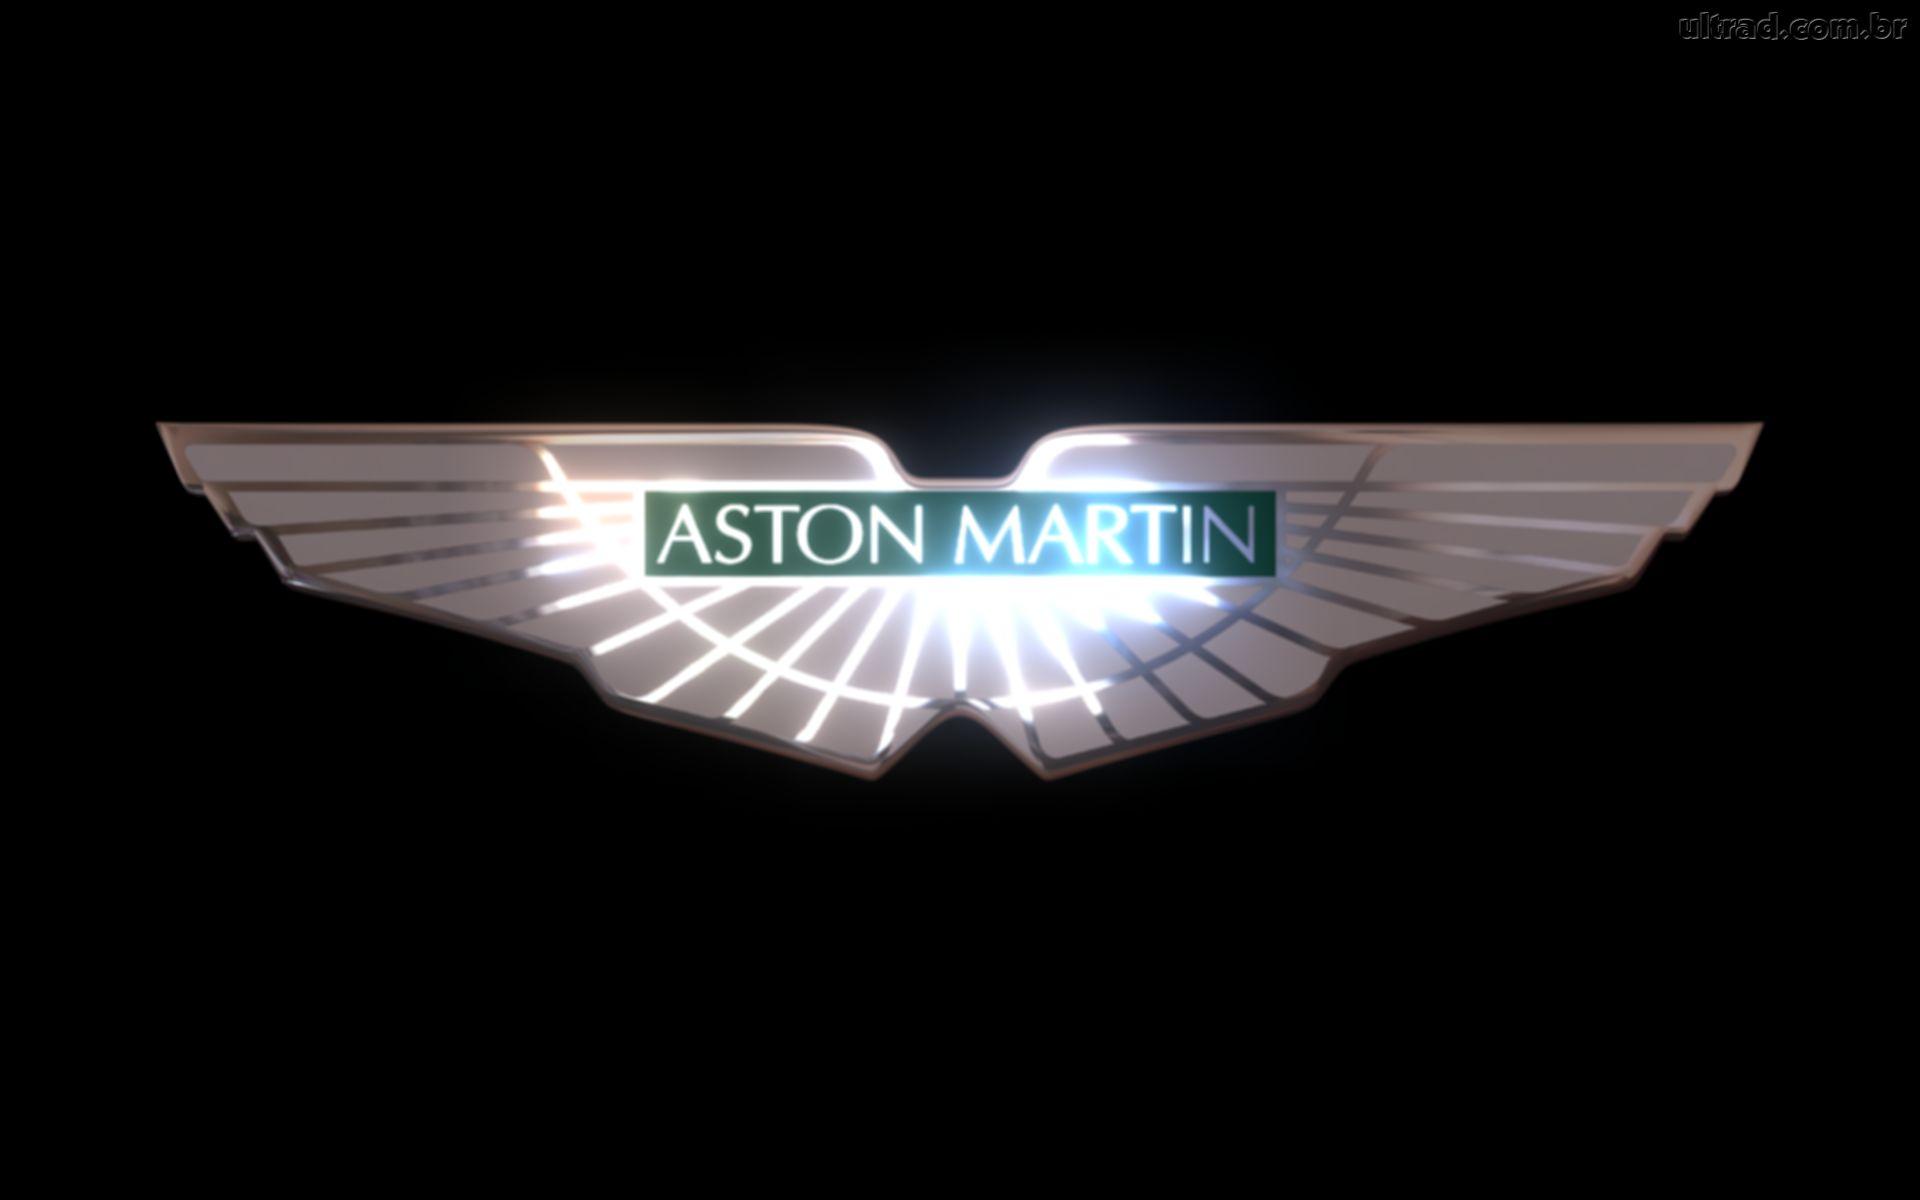 Us Military Wallpaper Quotes Aston Martin Logo Hd Car Logo Beautiful Image 24152